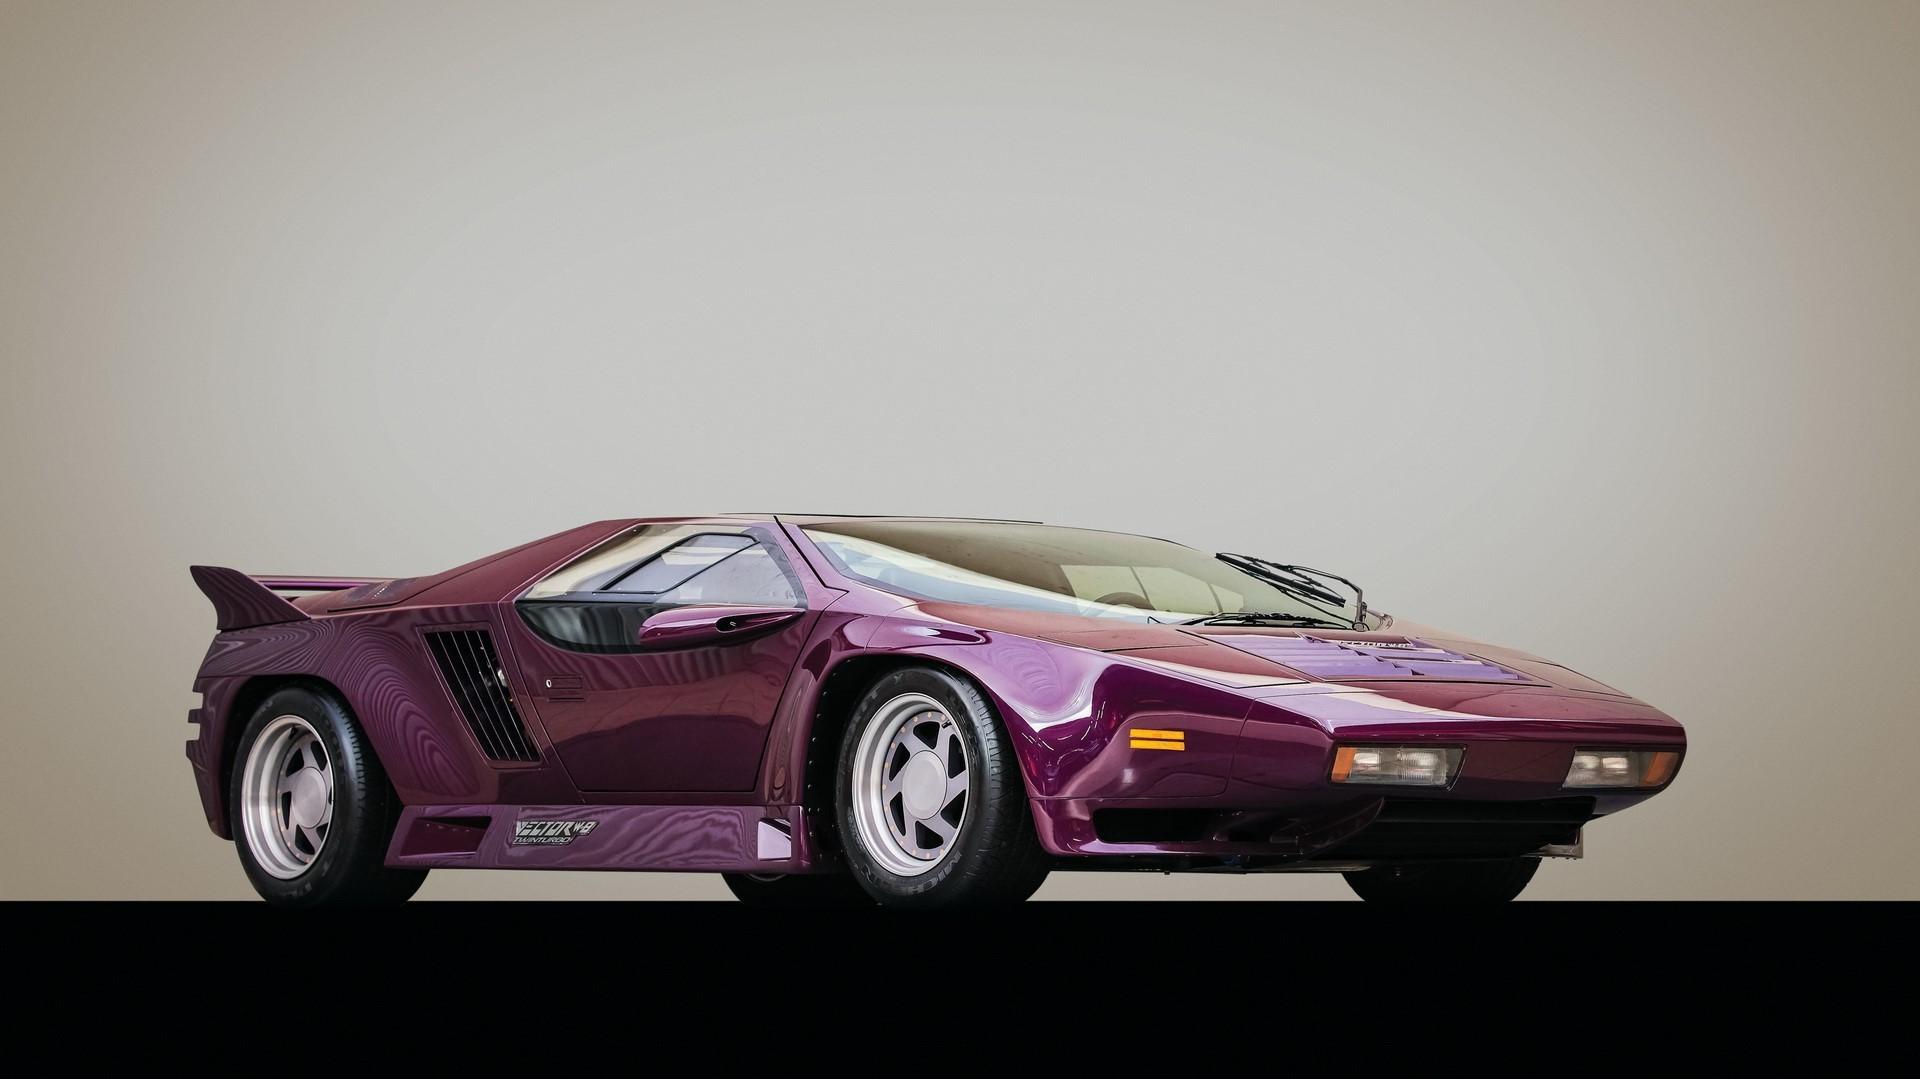 Echando un vistazo a este Vector W8 Twin Turbo púrpura